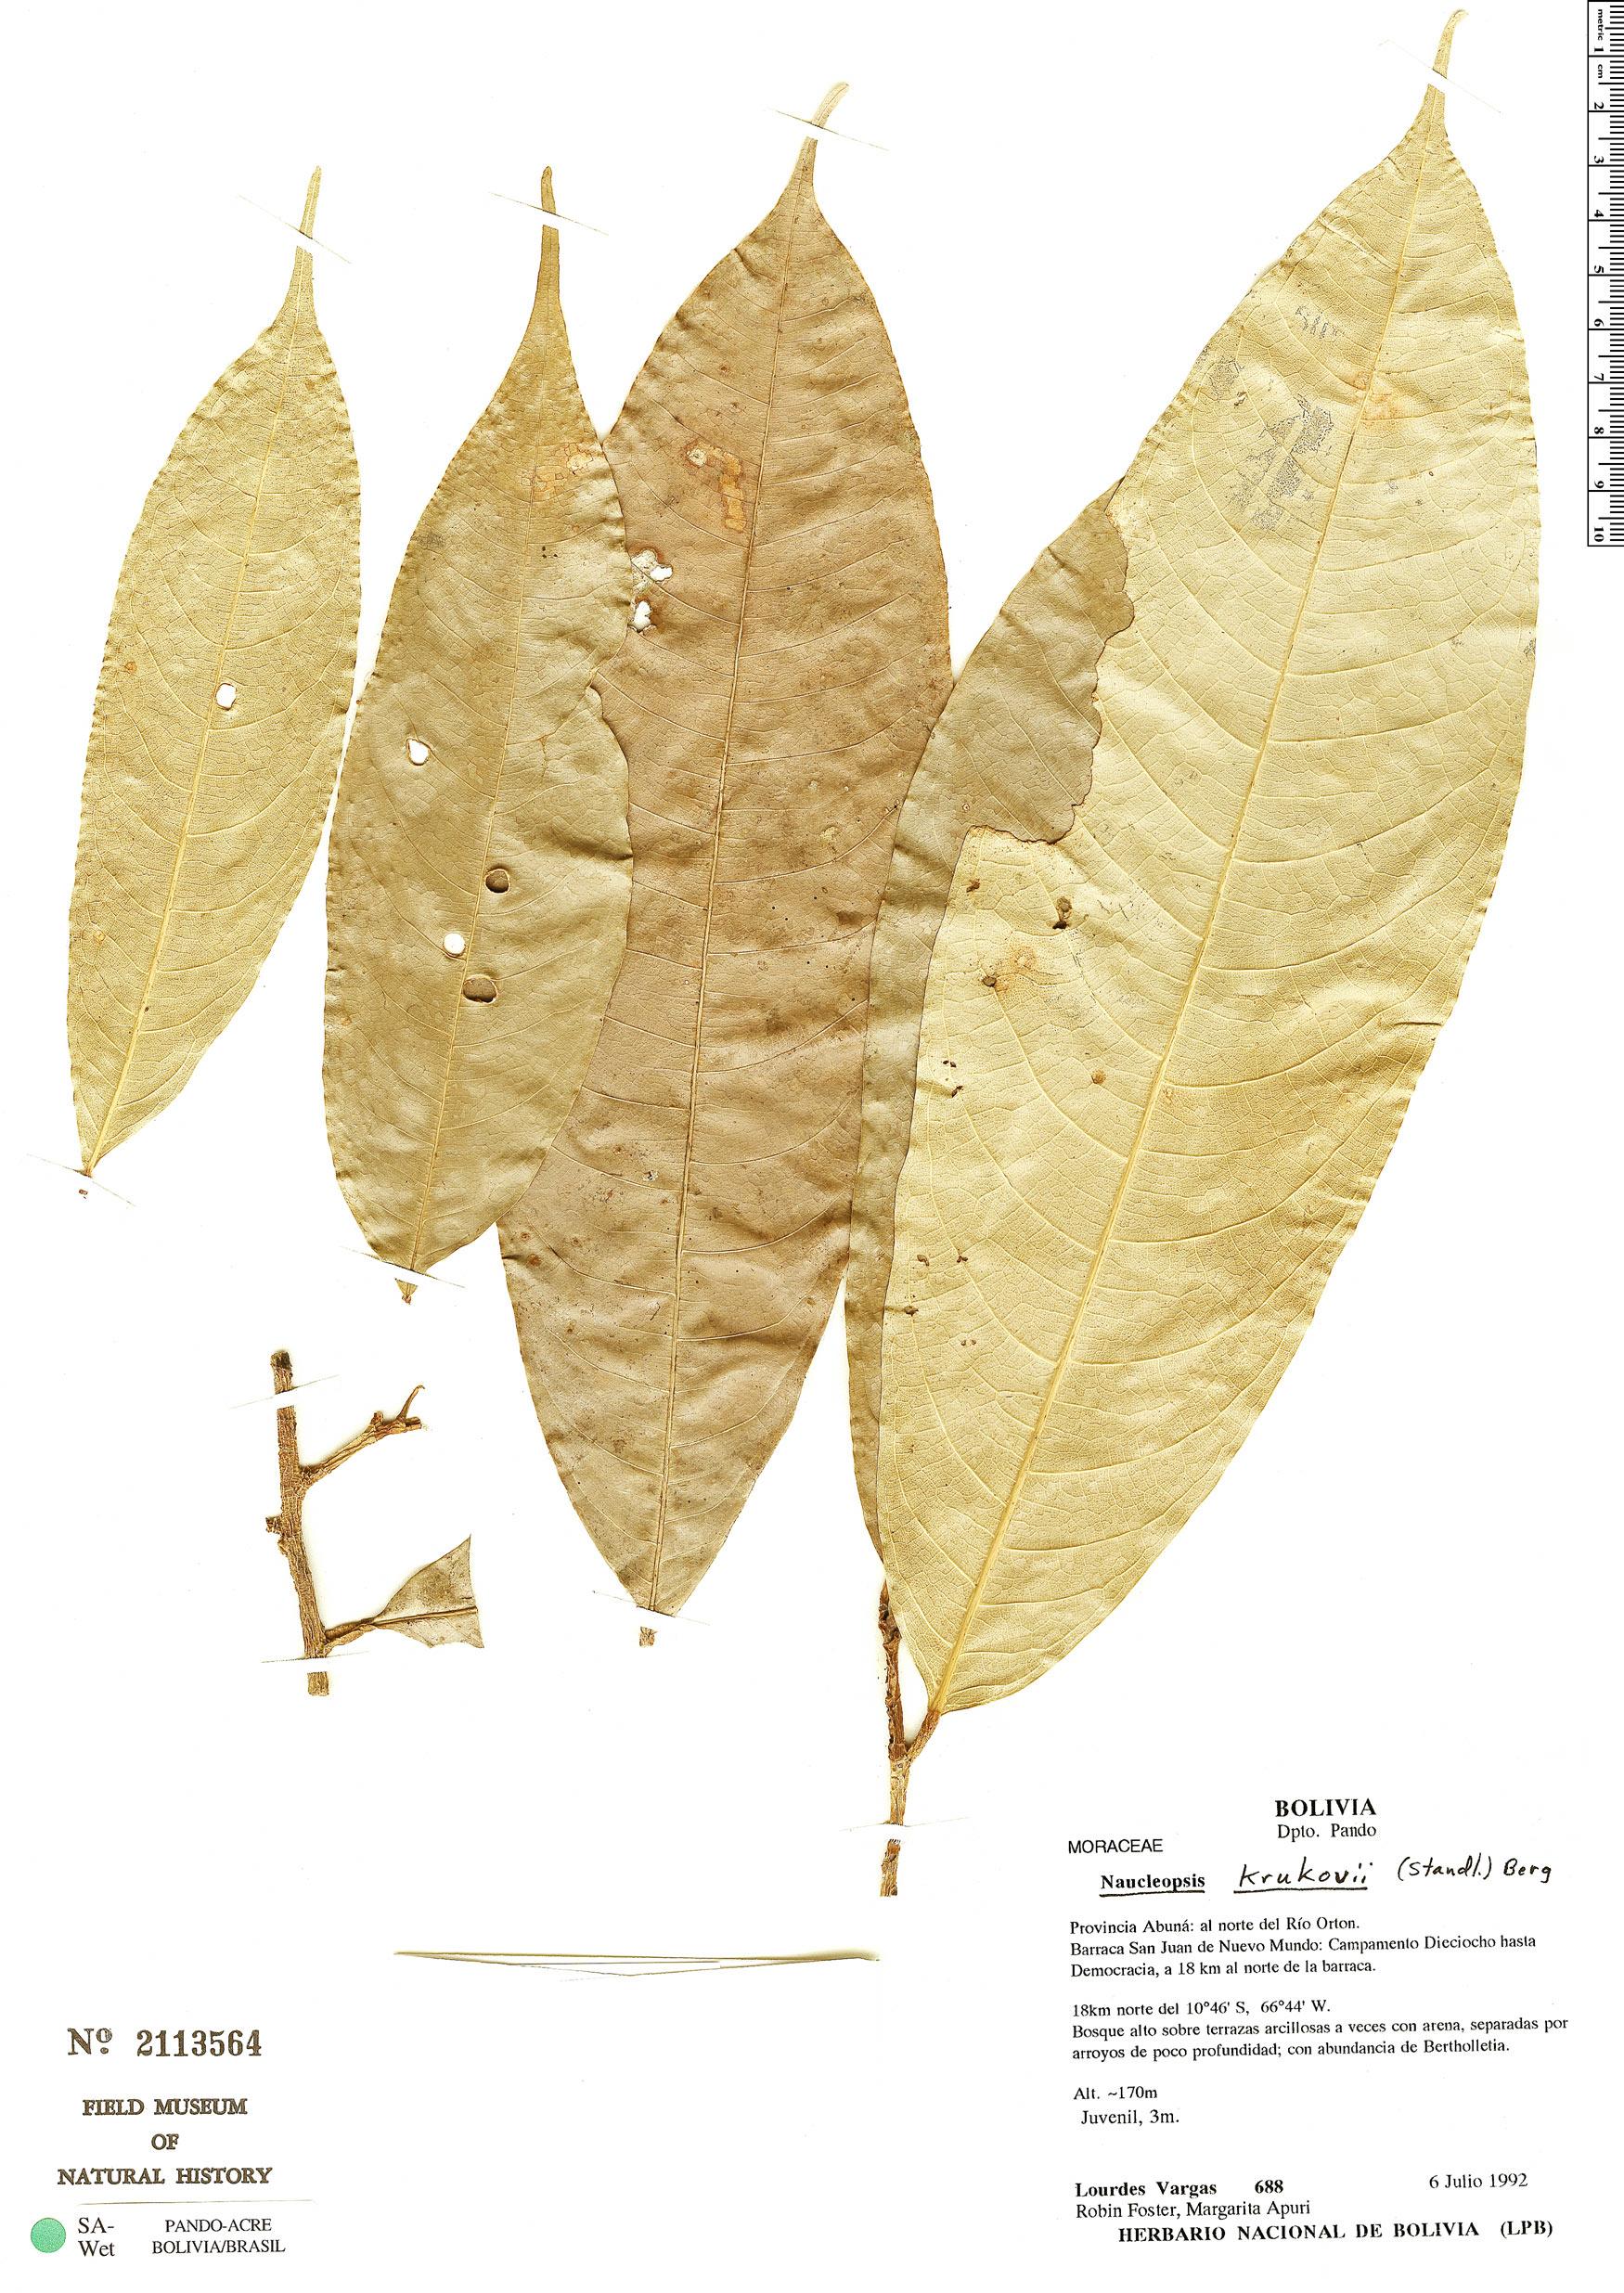 Specimen: Naucleopsis krukovii